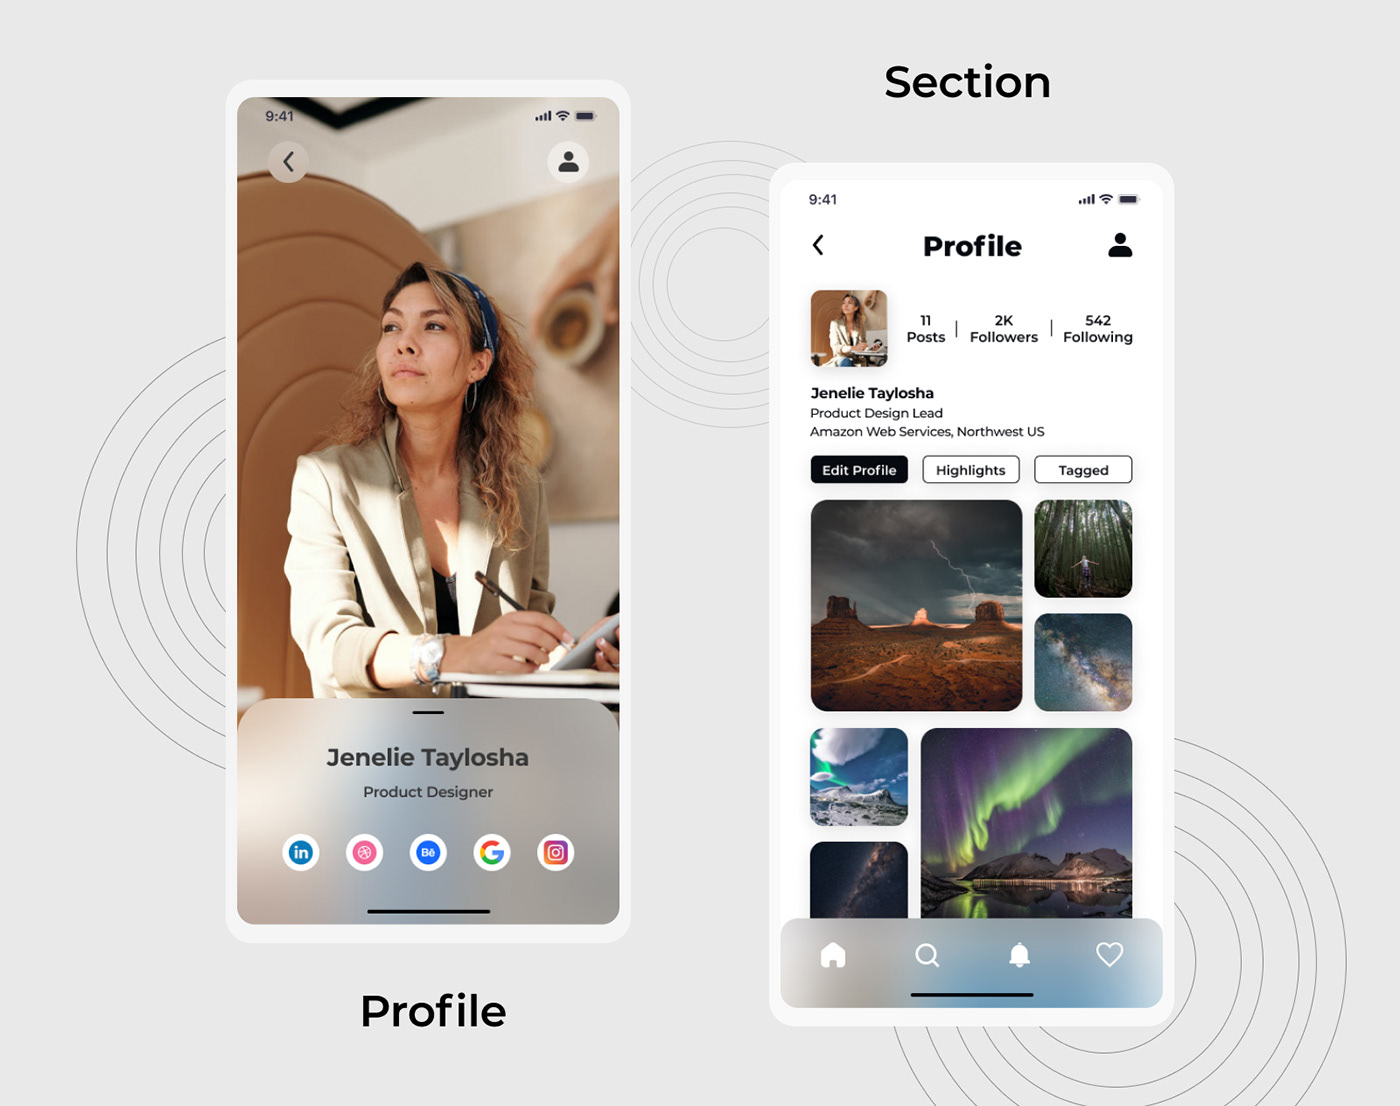 DailyUI designui profile profilesectionui UI uidesign uiideas uiinspiration UserInterface ux